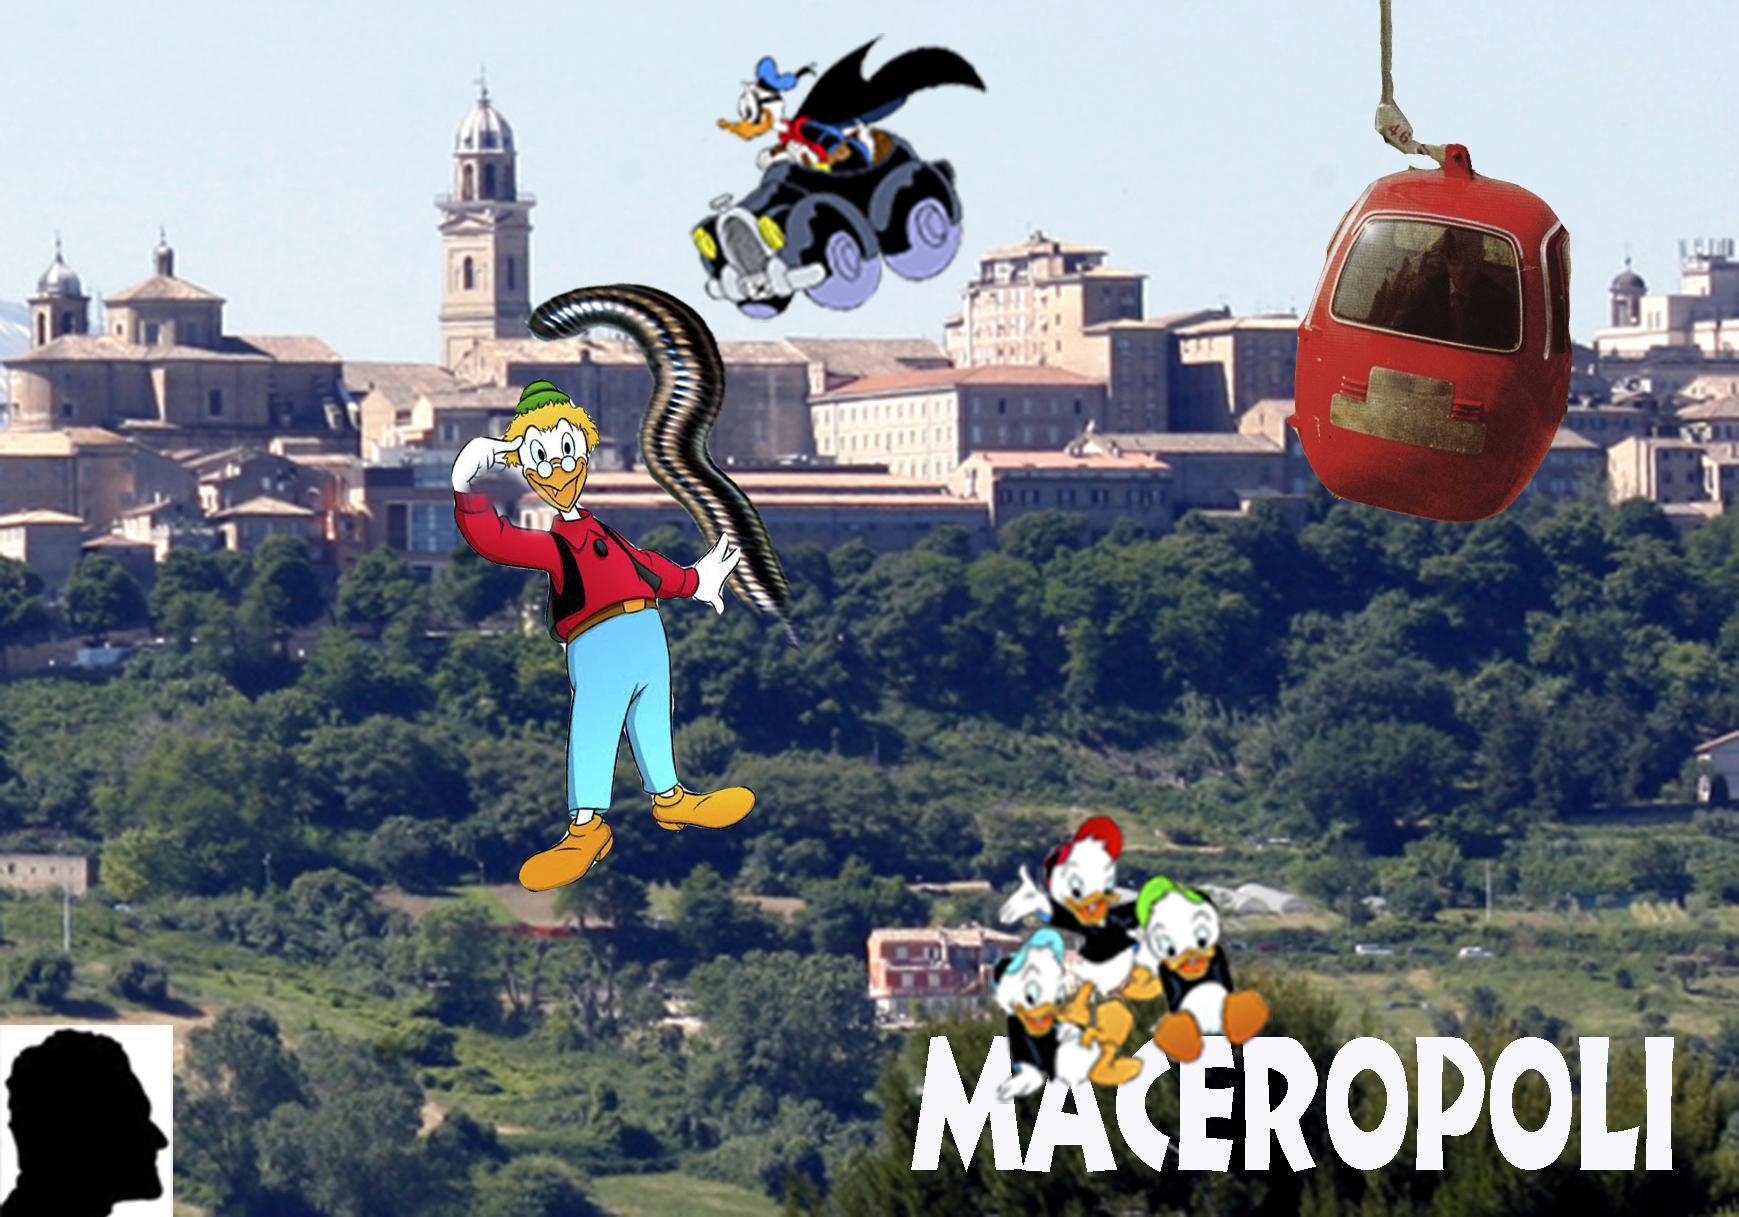 MACEROPOLI-2012